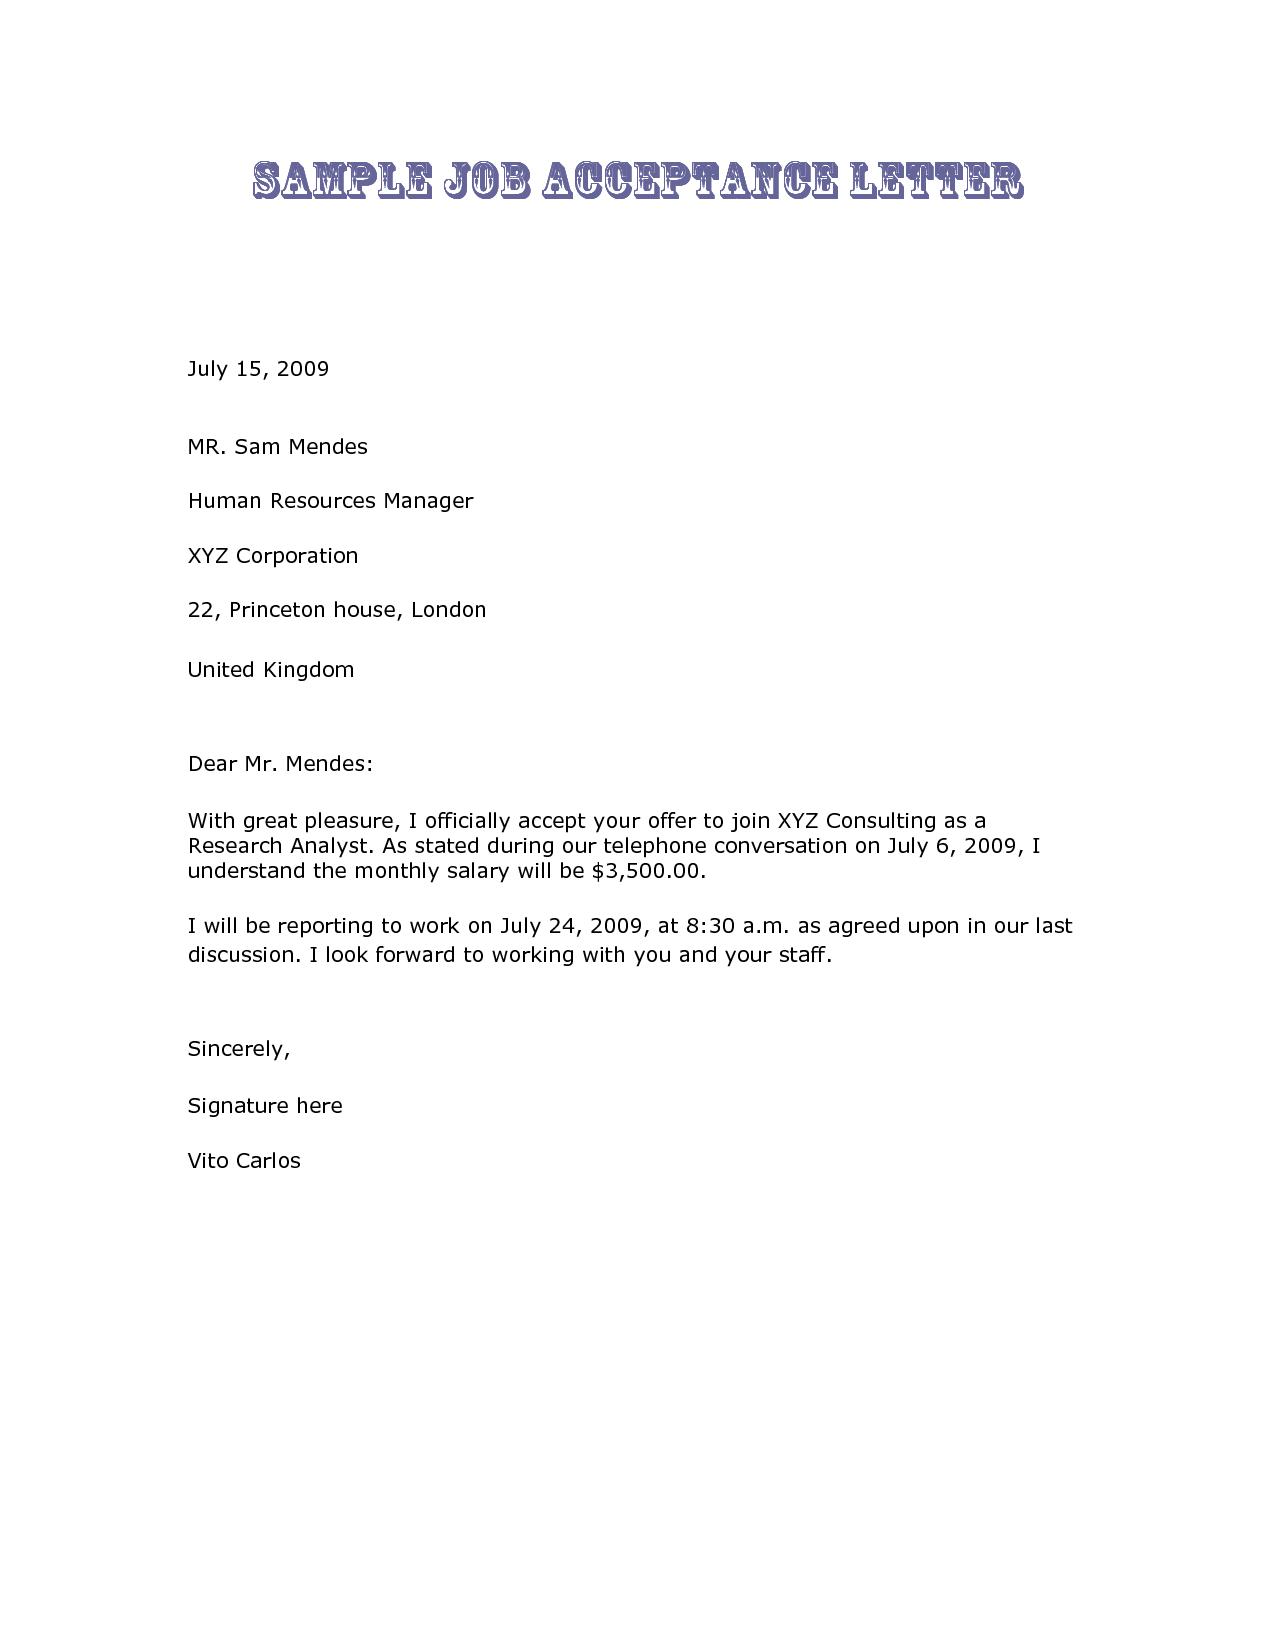 New Job Acceptance Letter Template Acceptance letter